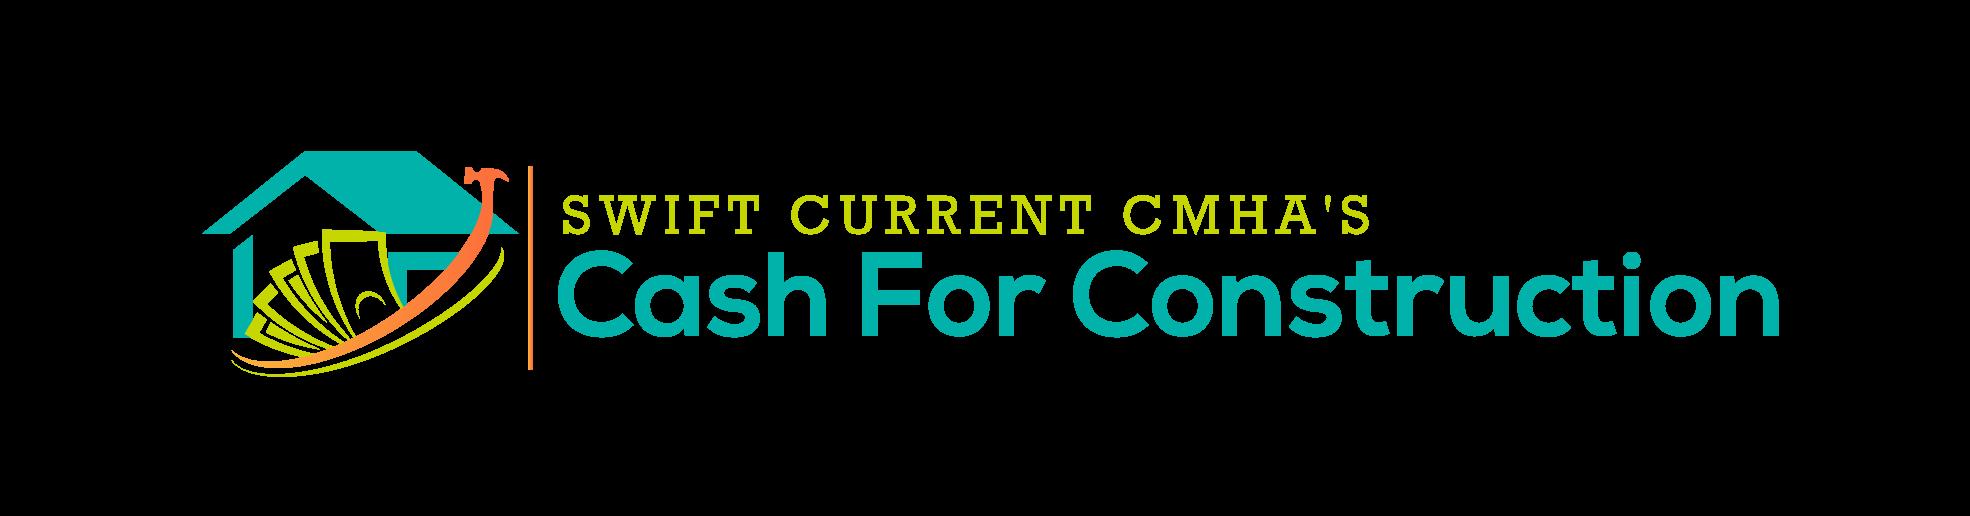 Swift Current CMHA's Cash for Construction